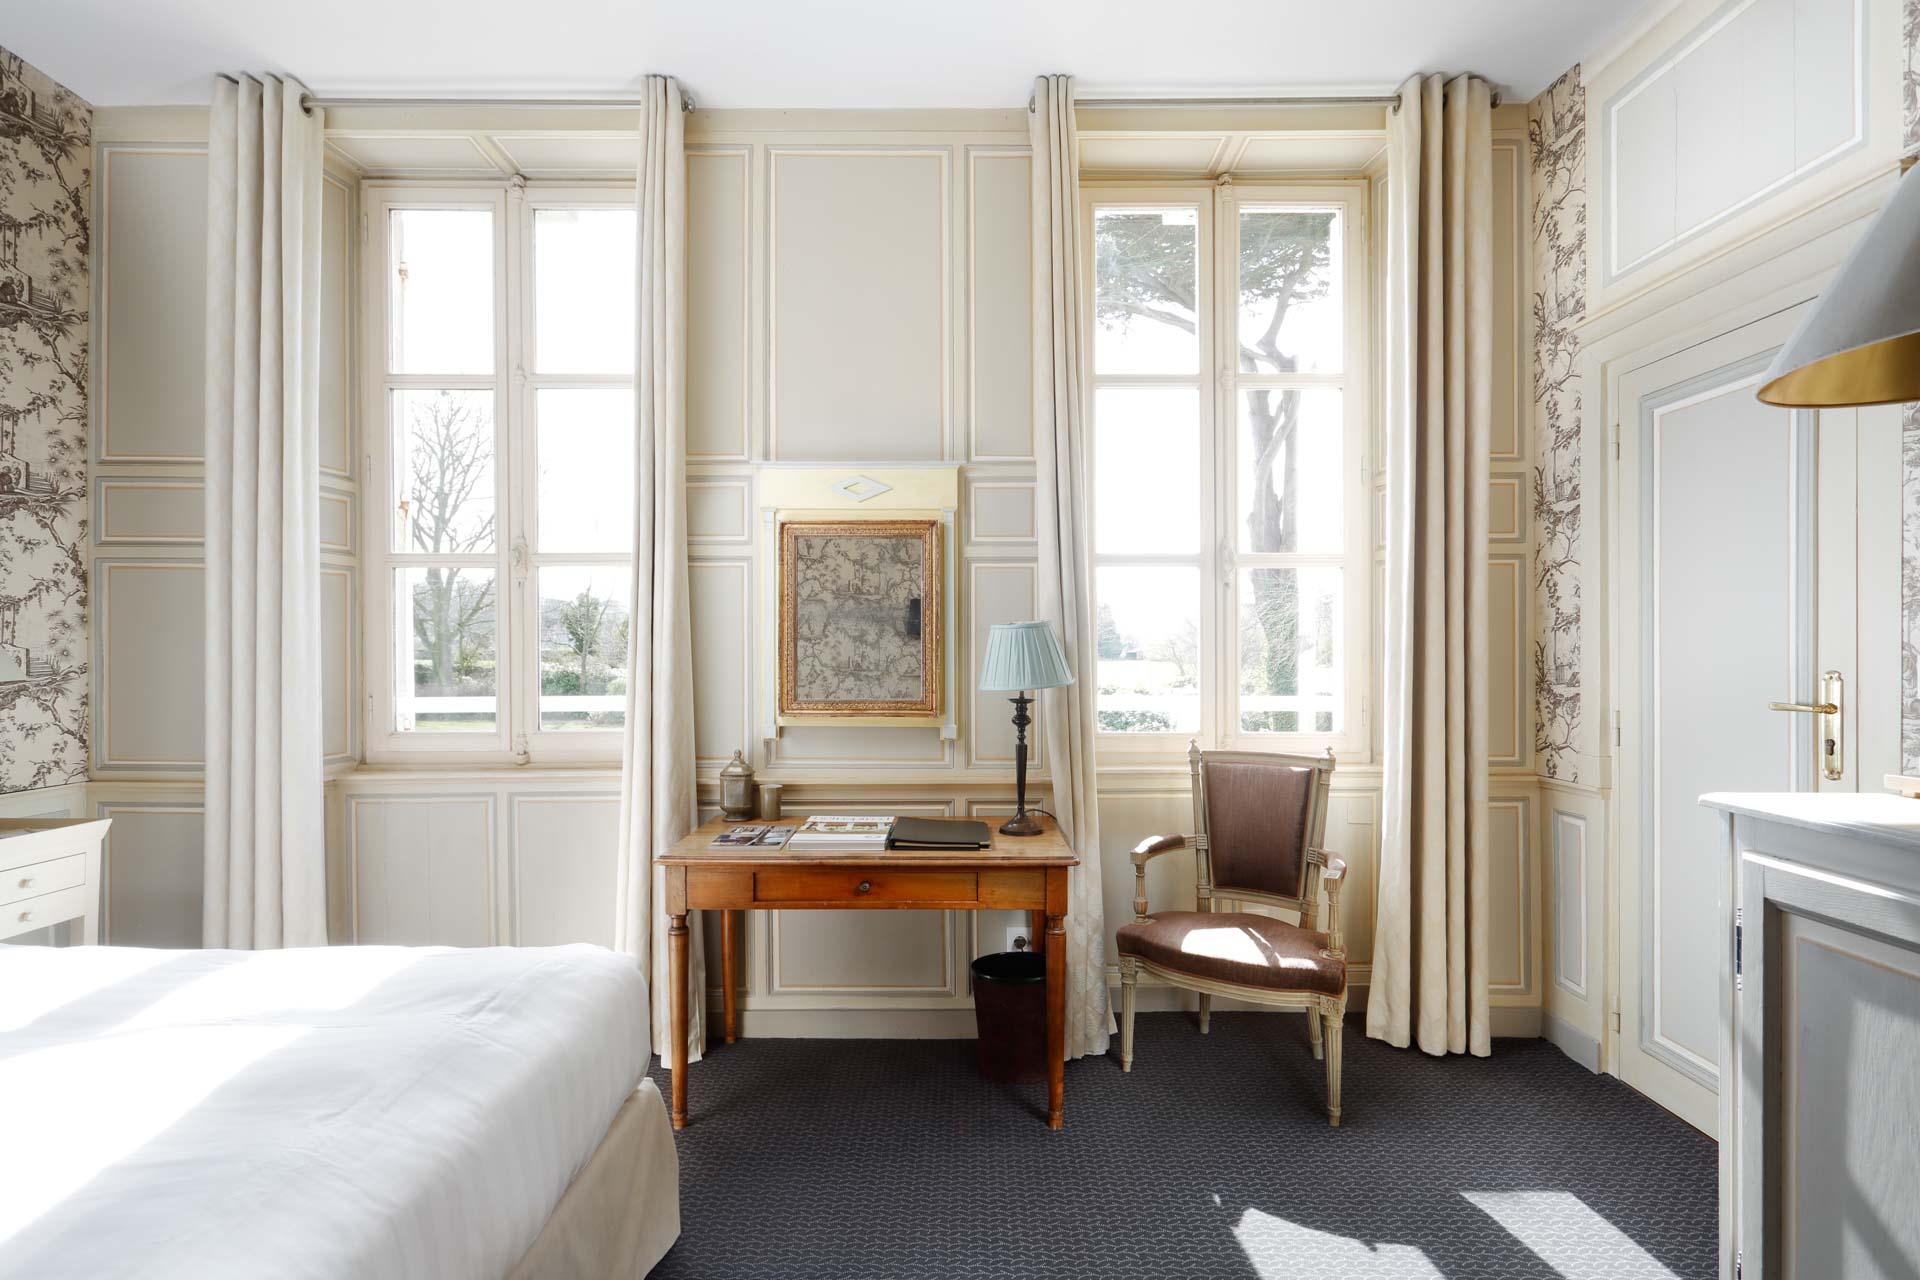 Chambre 102 à La Chenevière © Philippe Beuf